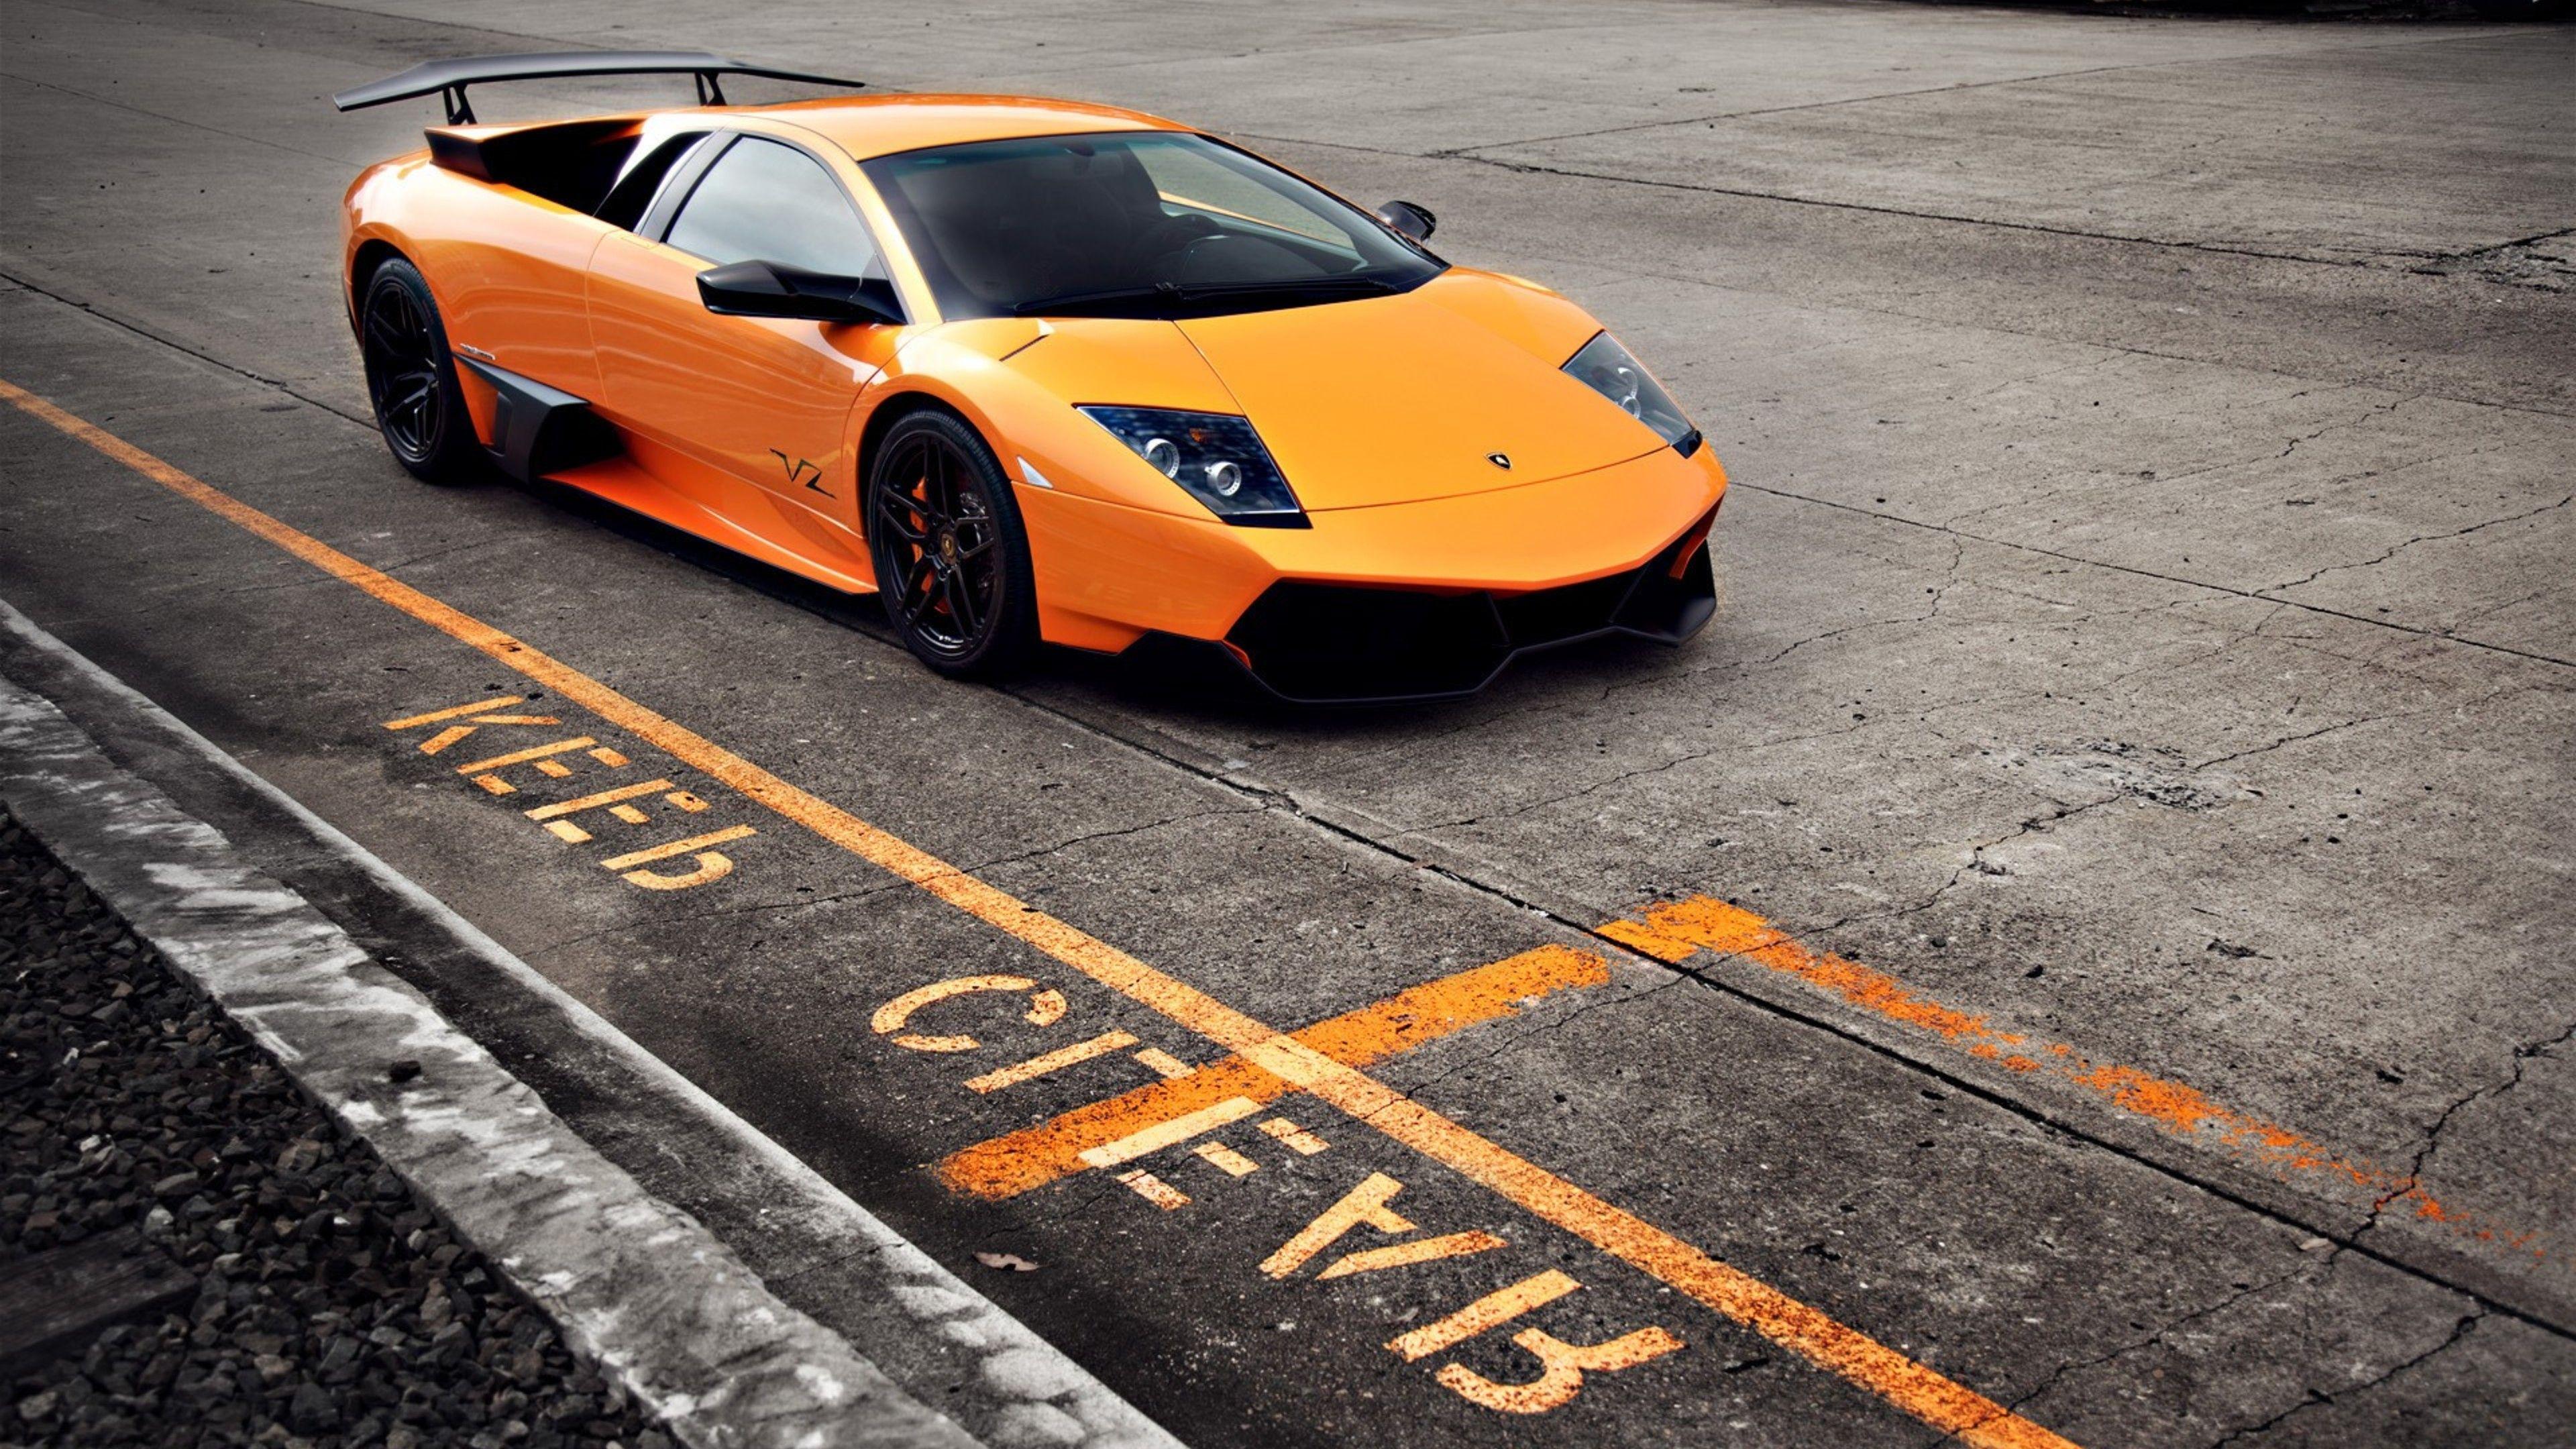 Lamborghini Murcielago Wallpapers Top Free Lamborghini Murcielago